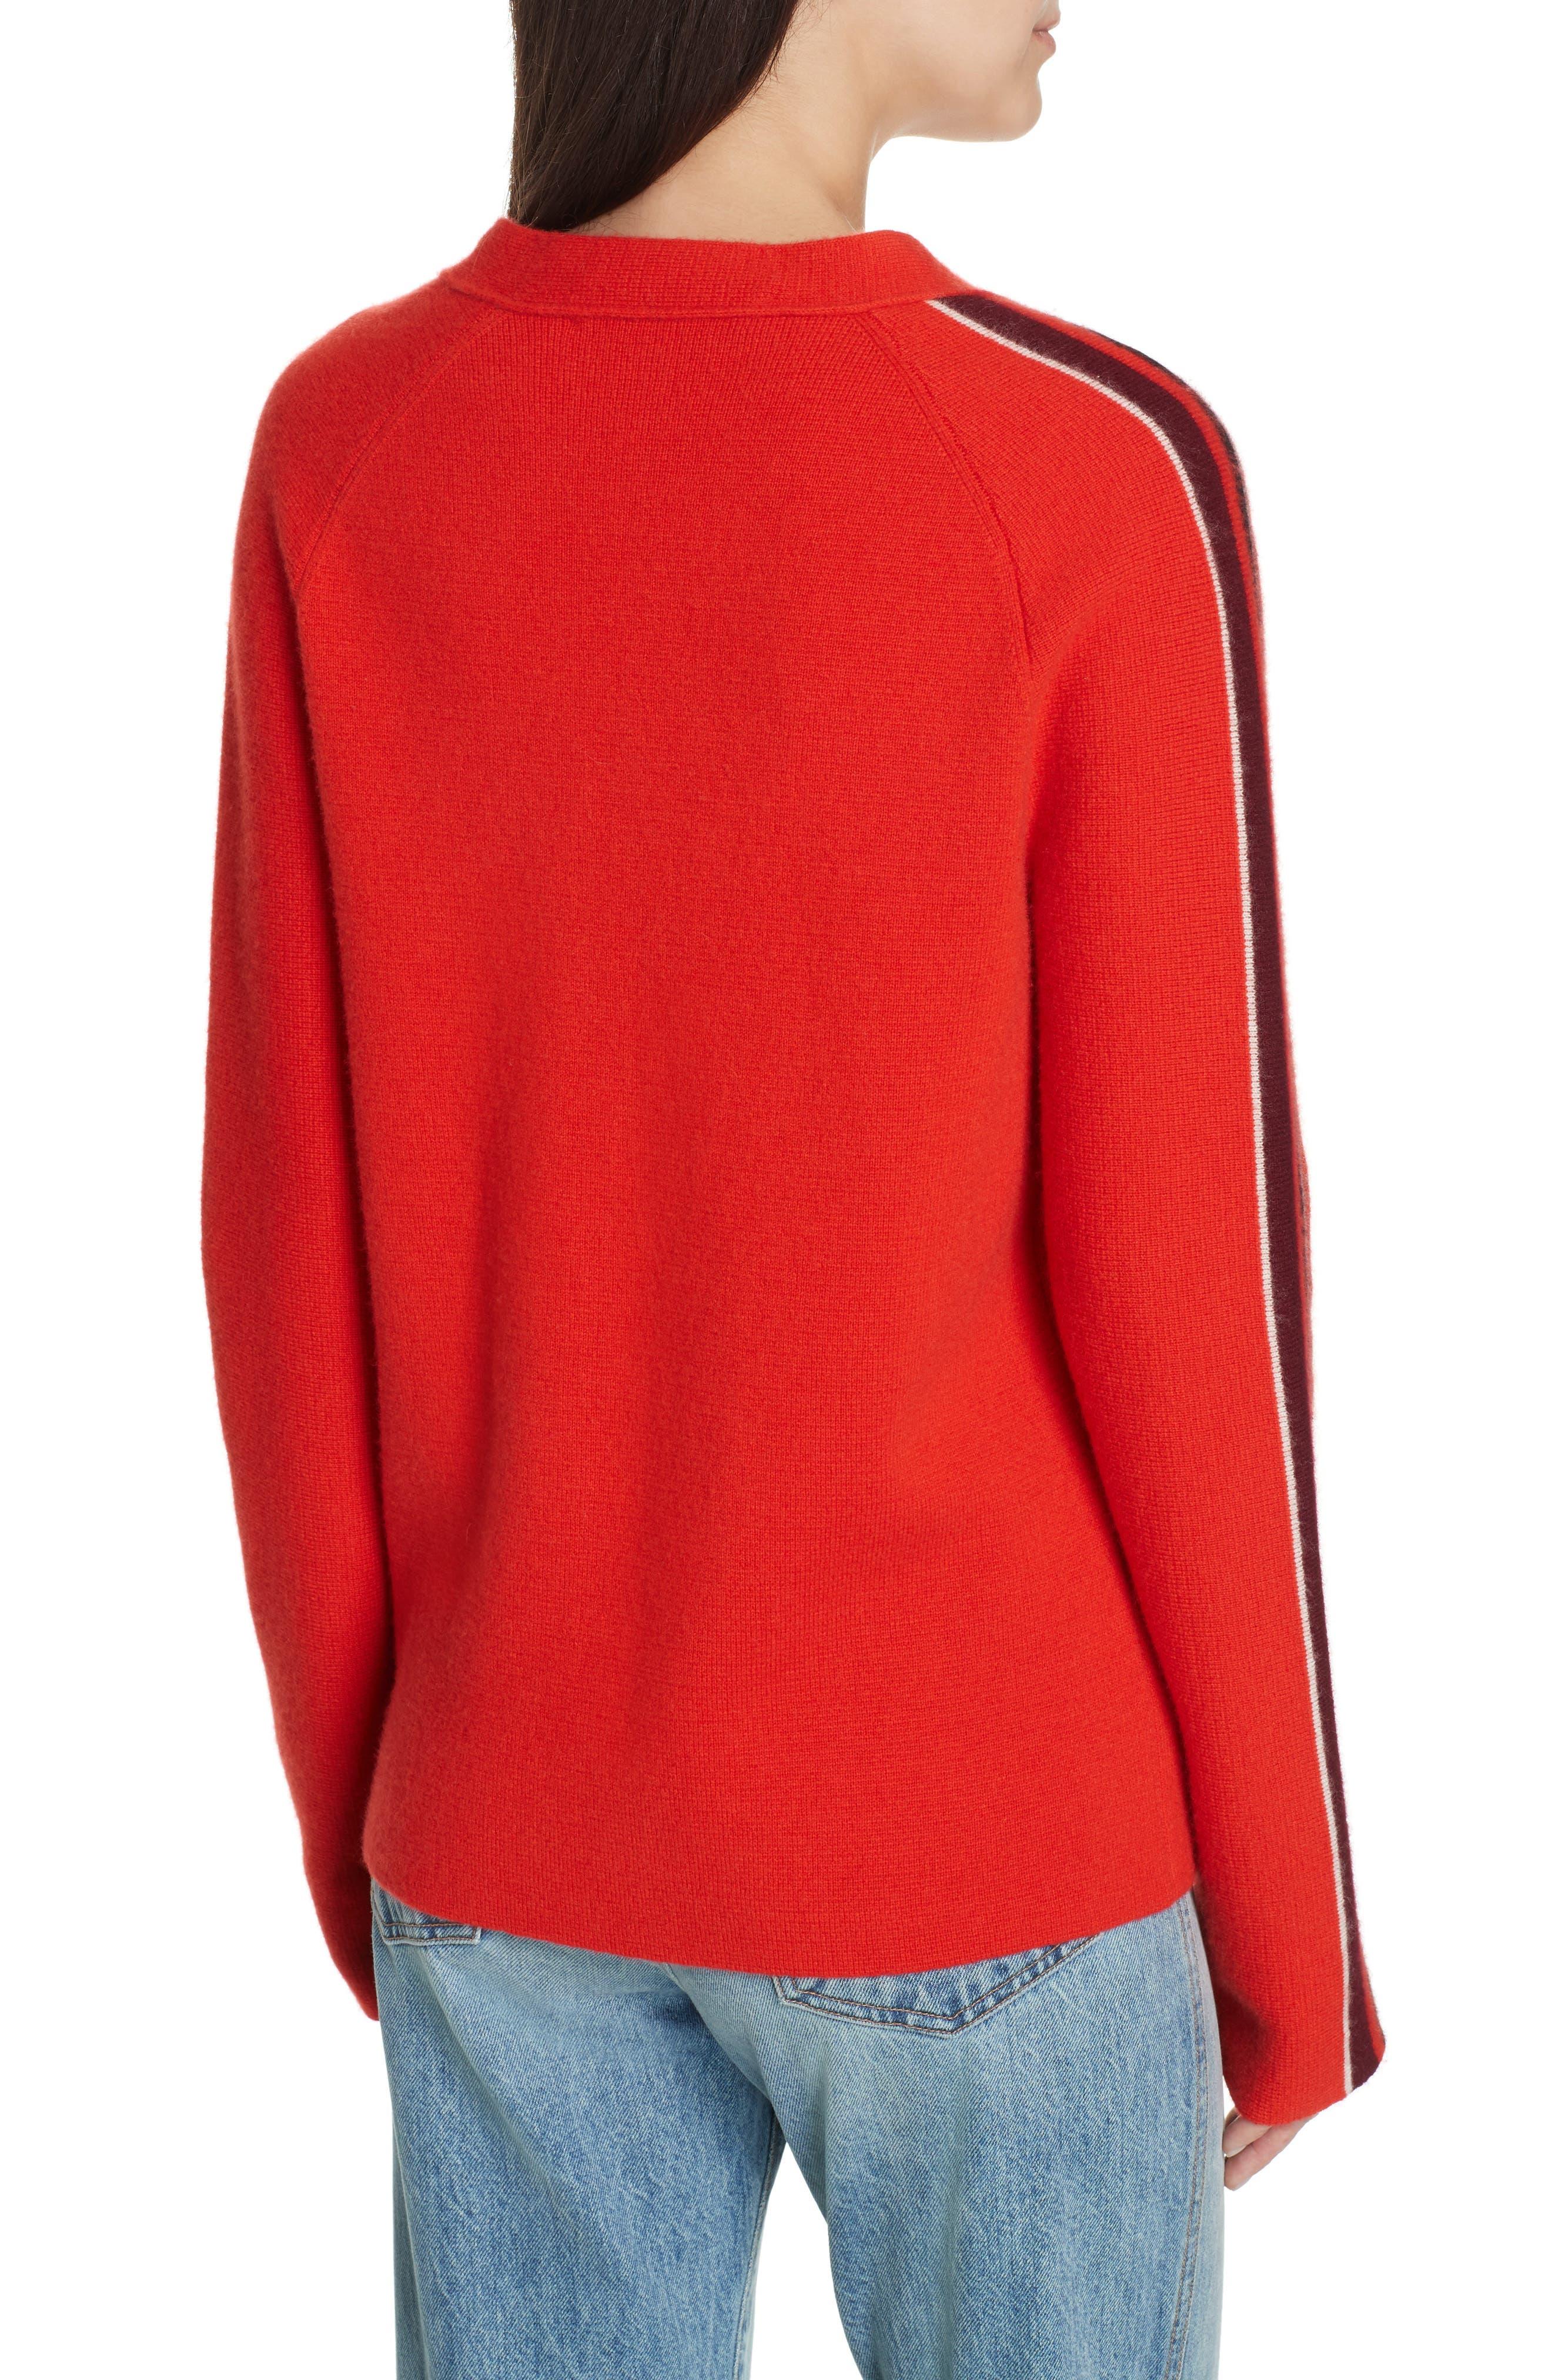 PSWL Stripe Sleeve Merino Wool & Cashmere Cardigan,                             Alternate thumbnail 2, color,                             RED COMBO